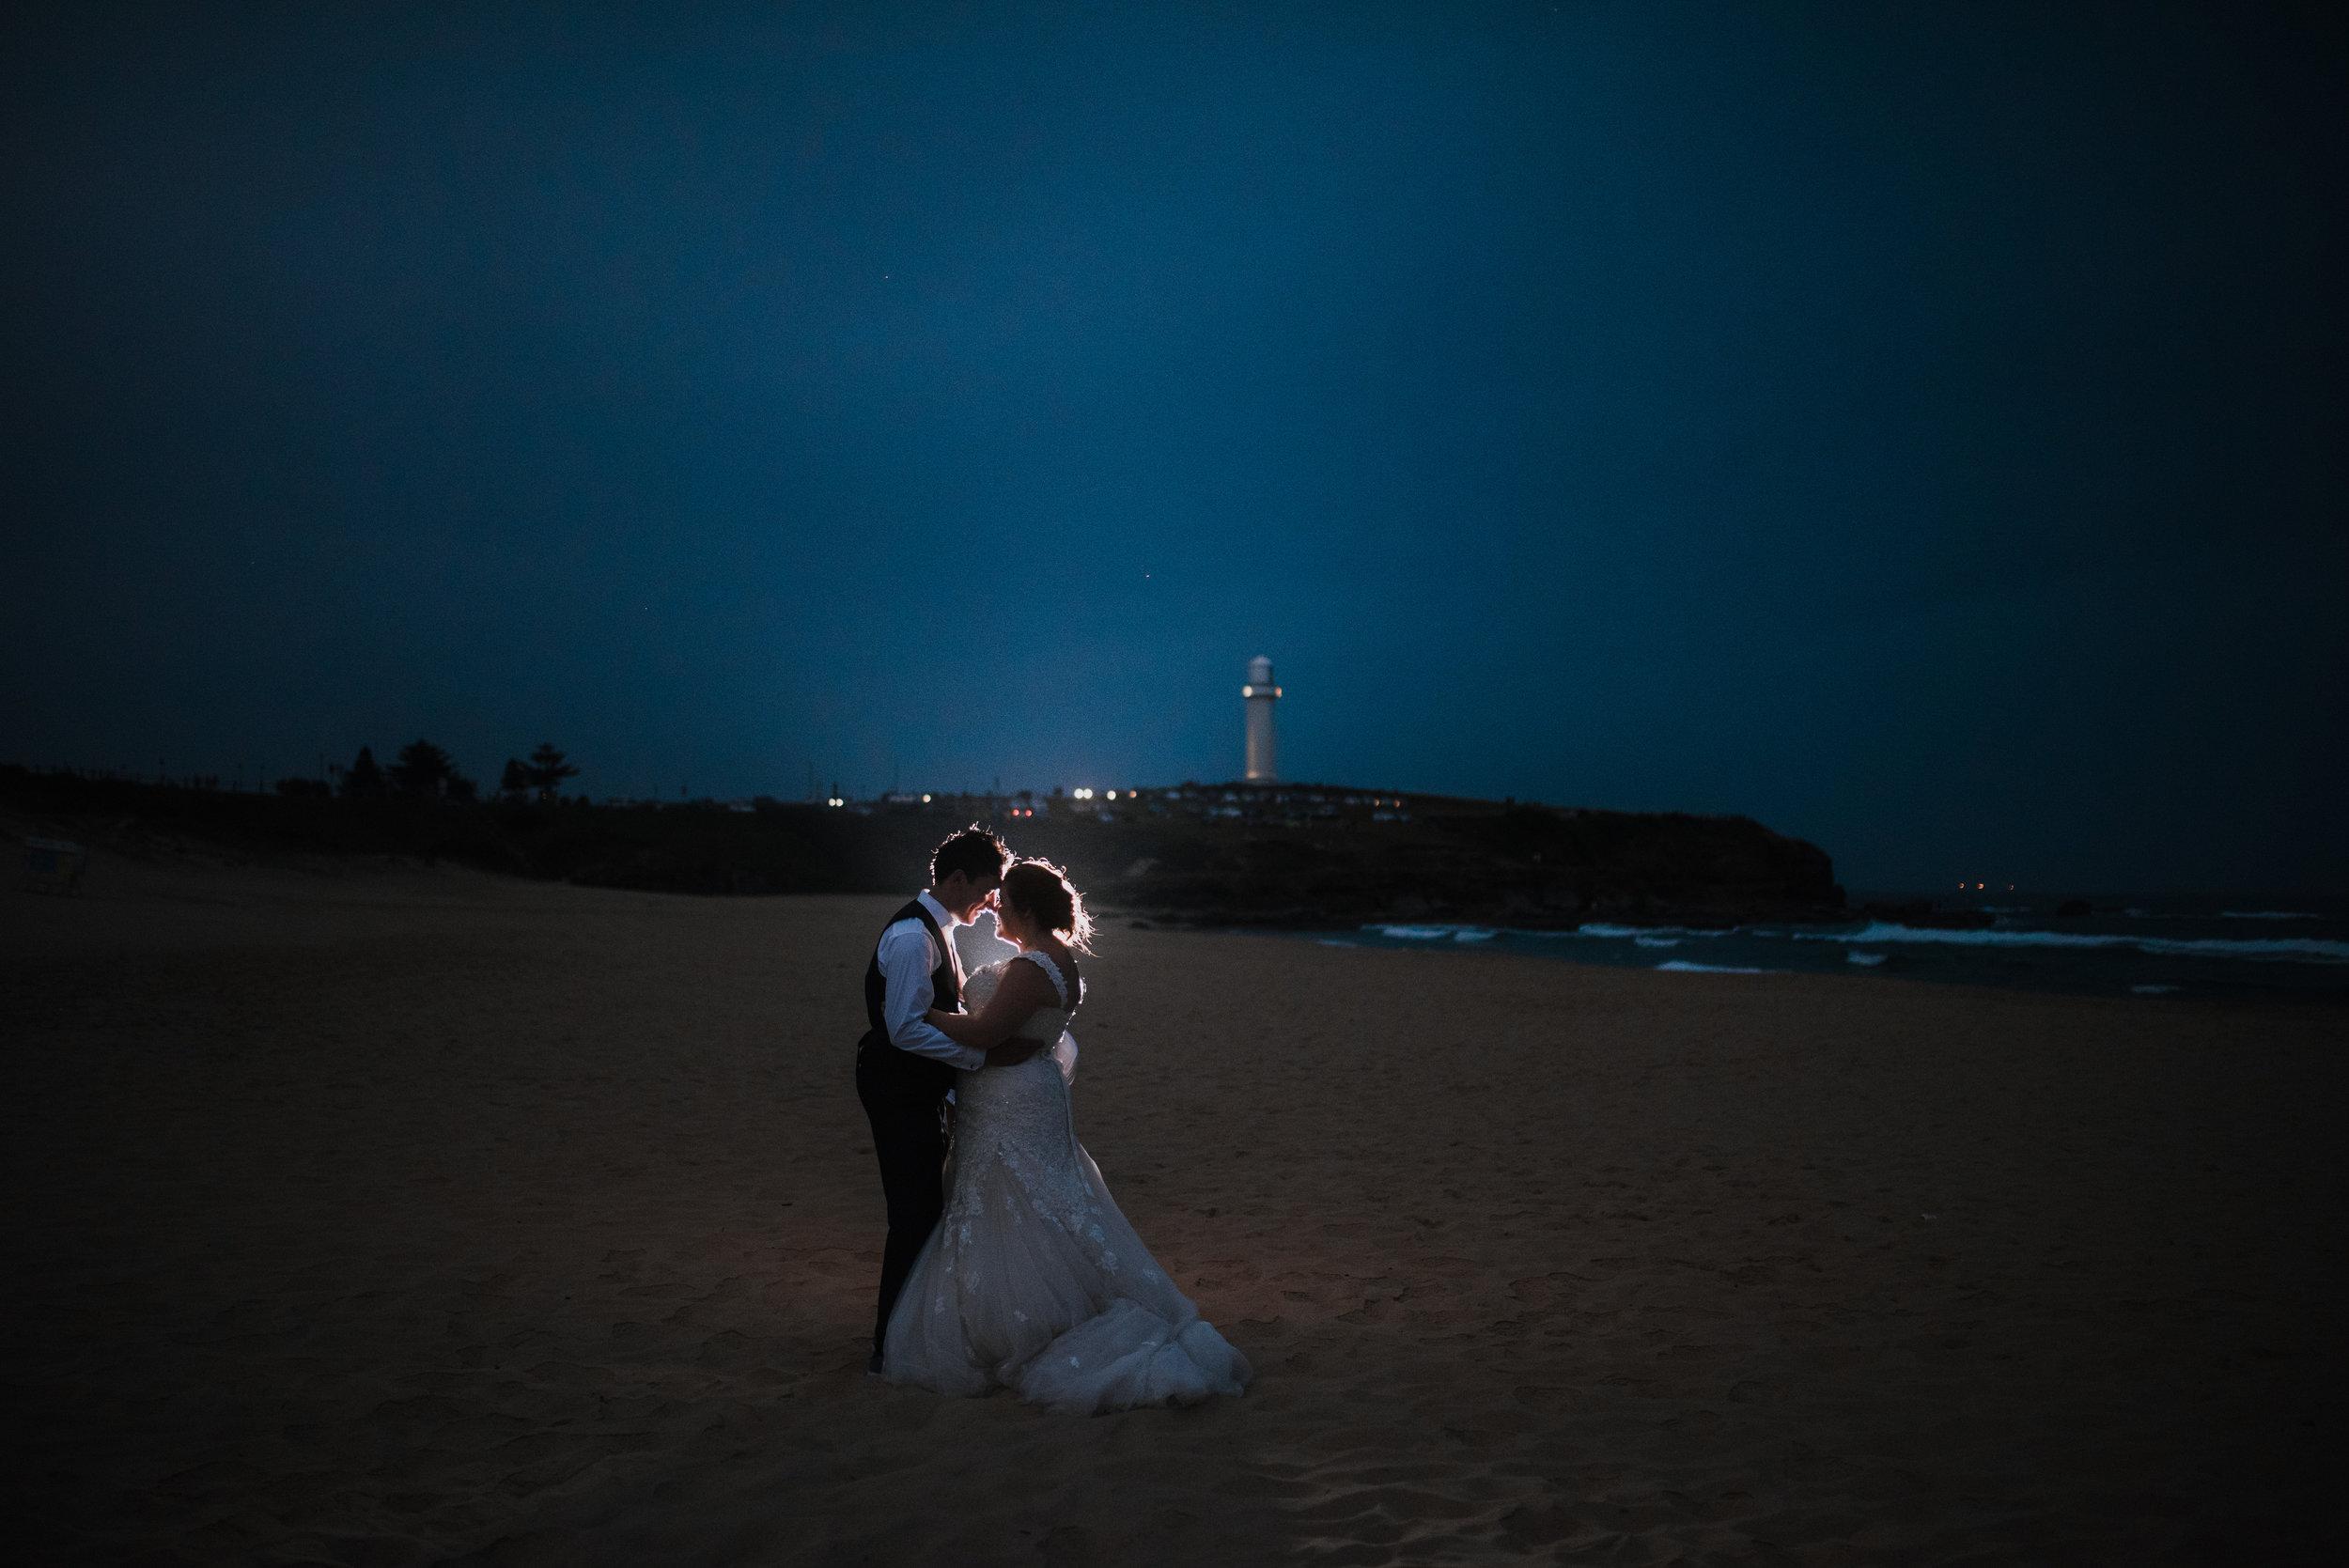 Jessica & Shannon - Wollongong Botanic Gardens & City Beach Functions Wedding    27th January 2018